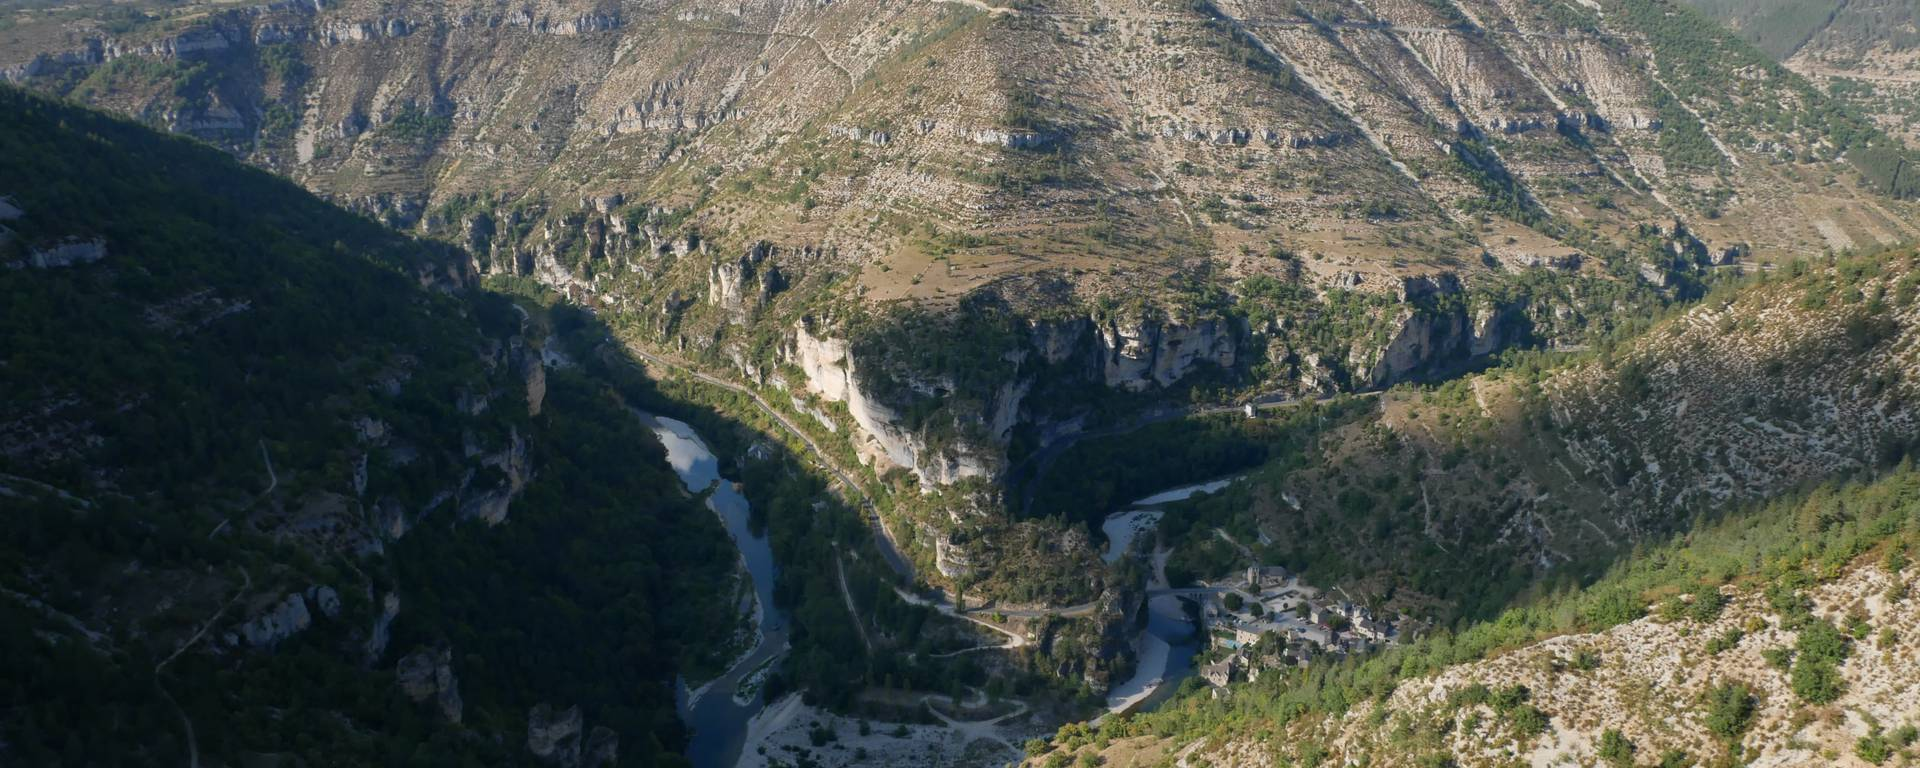 Panorama du Mas Saint-Chély, gorges du Tarn